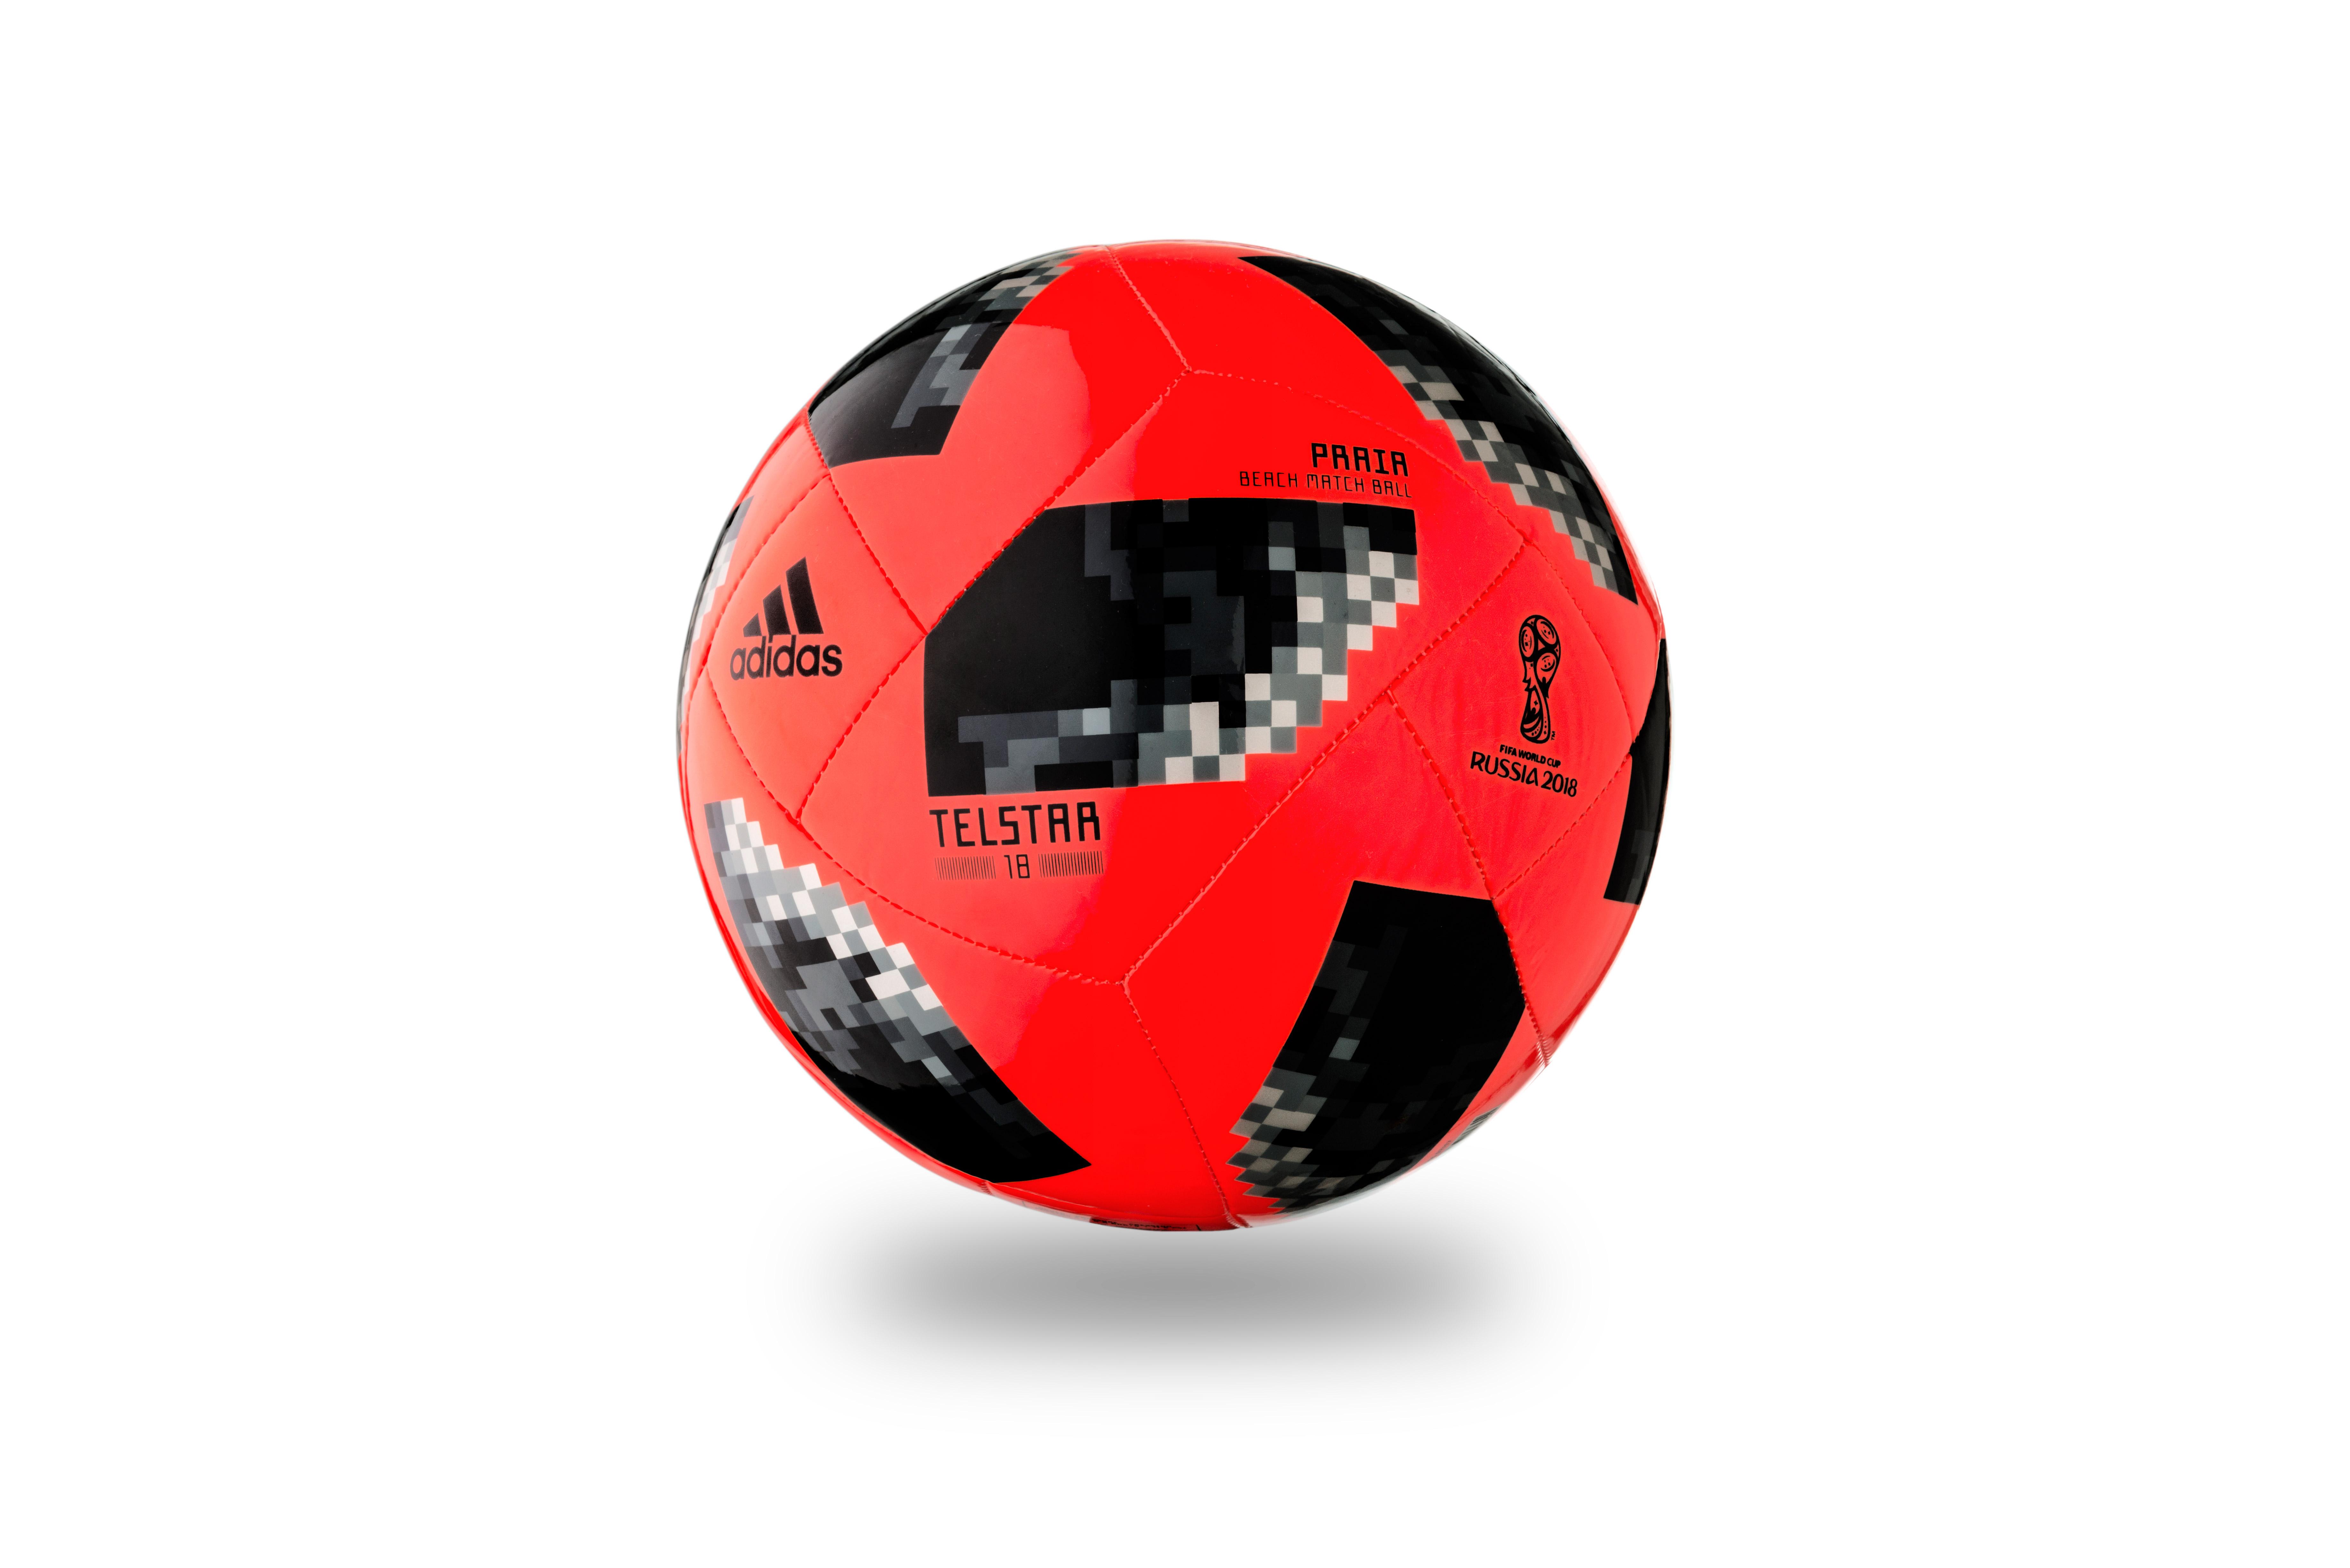 Official adidas Beach Soccer Ball 2018 Telstar Praia – Beach Soccer ... 85bffe207d0ea